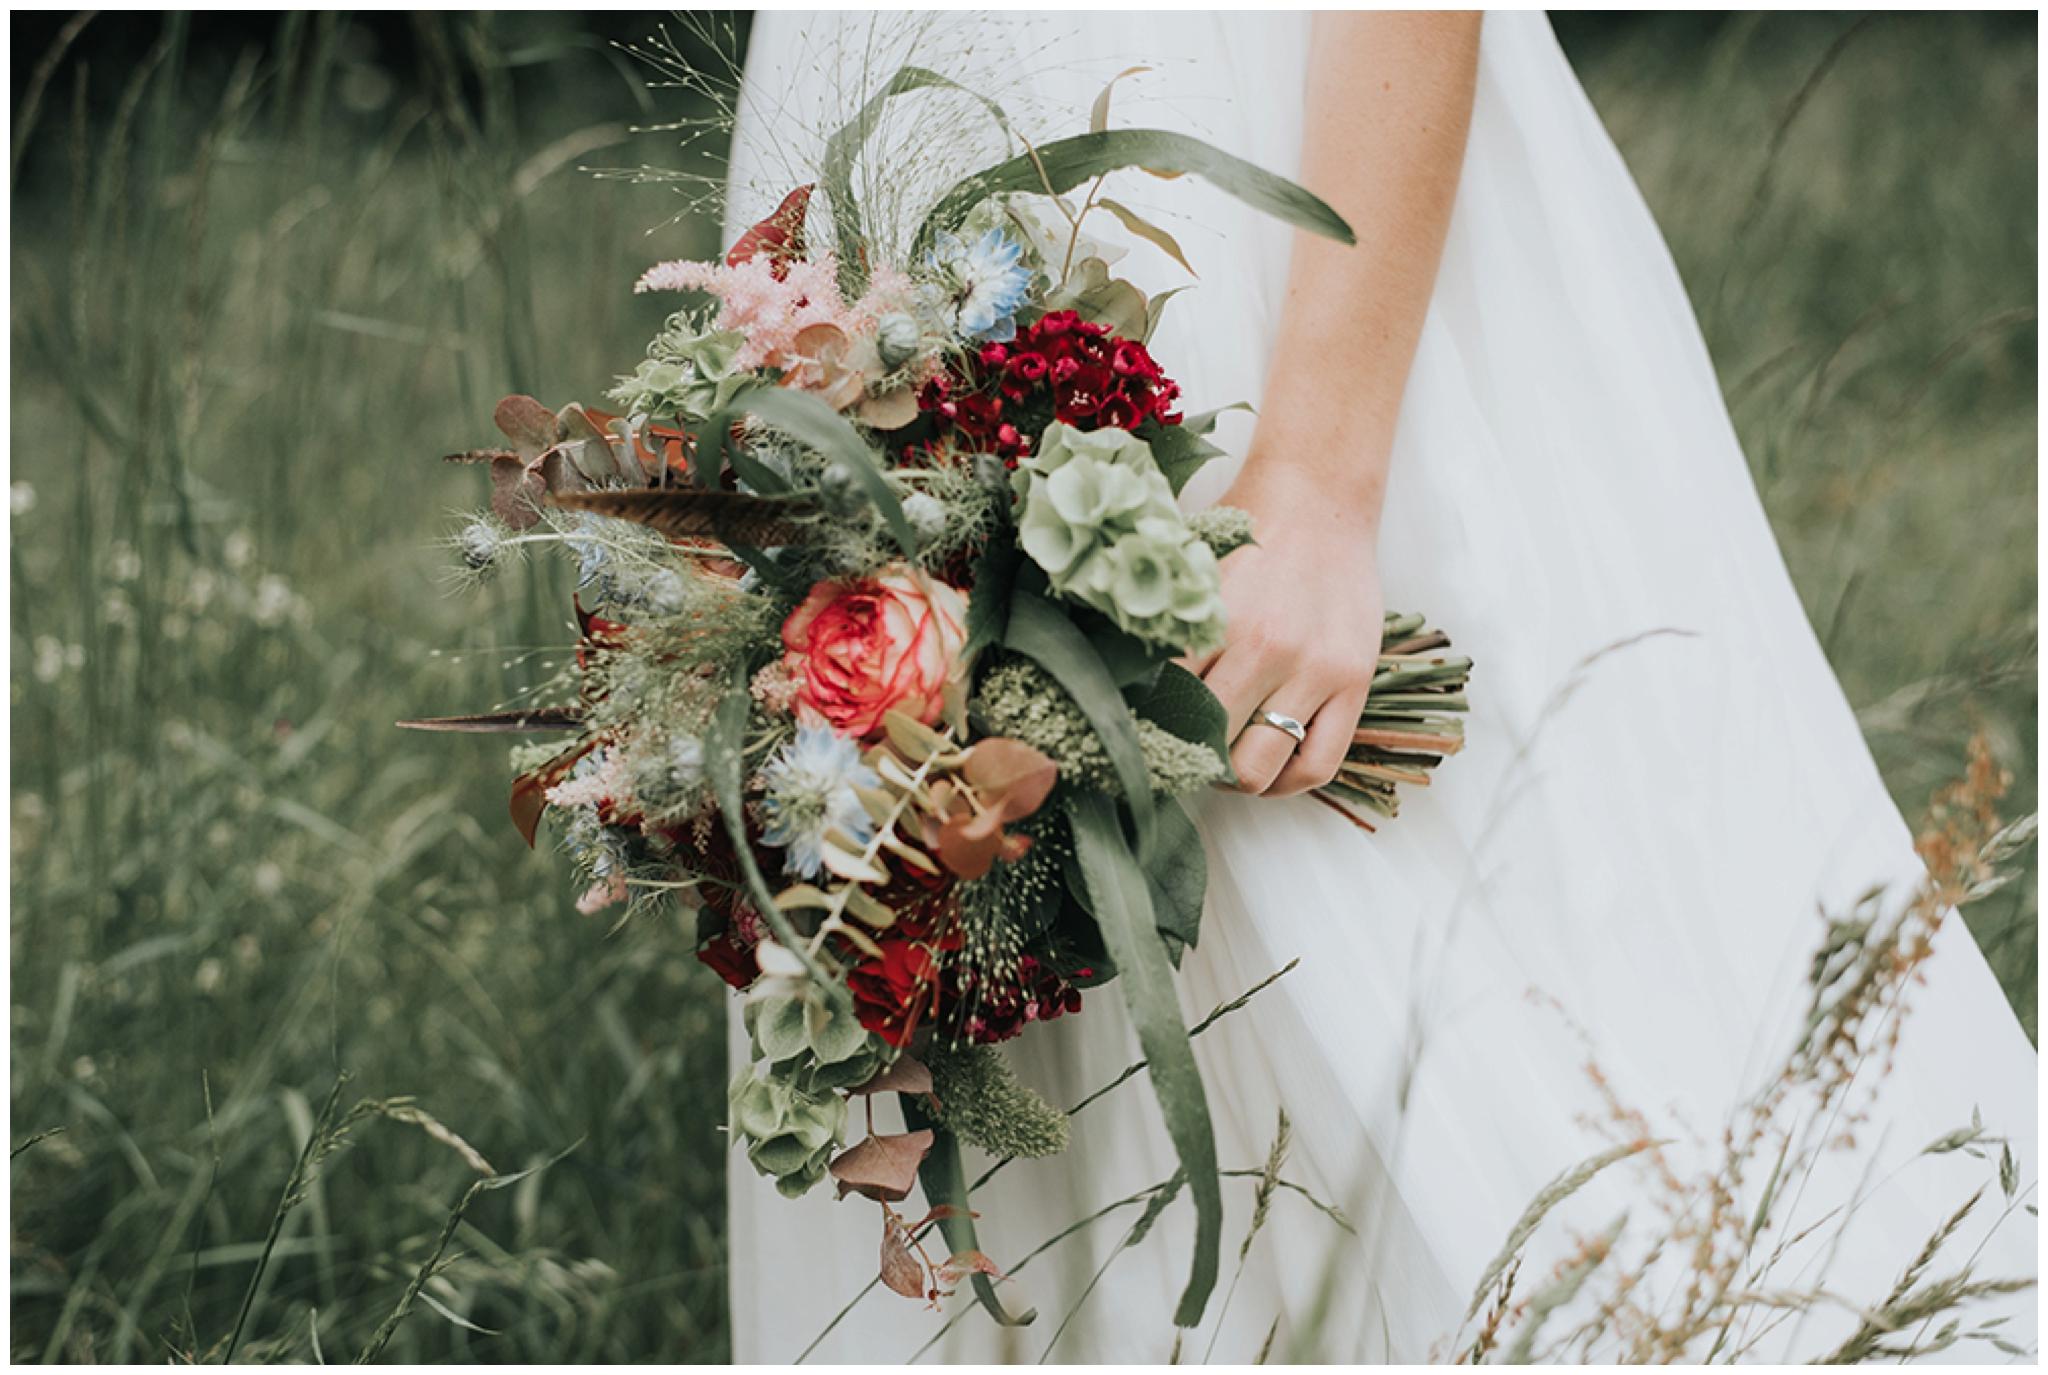 photographe-mariage-grenoble-annecy-lyon-shooting-inspiration-boheme-044